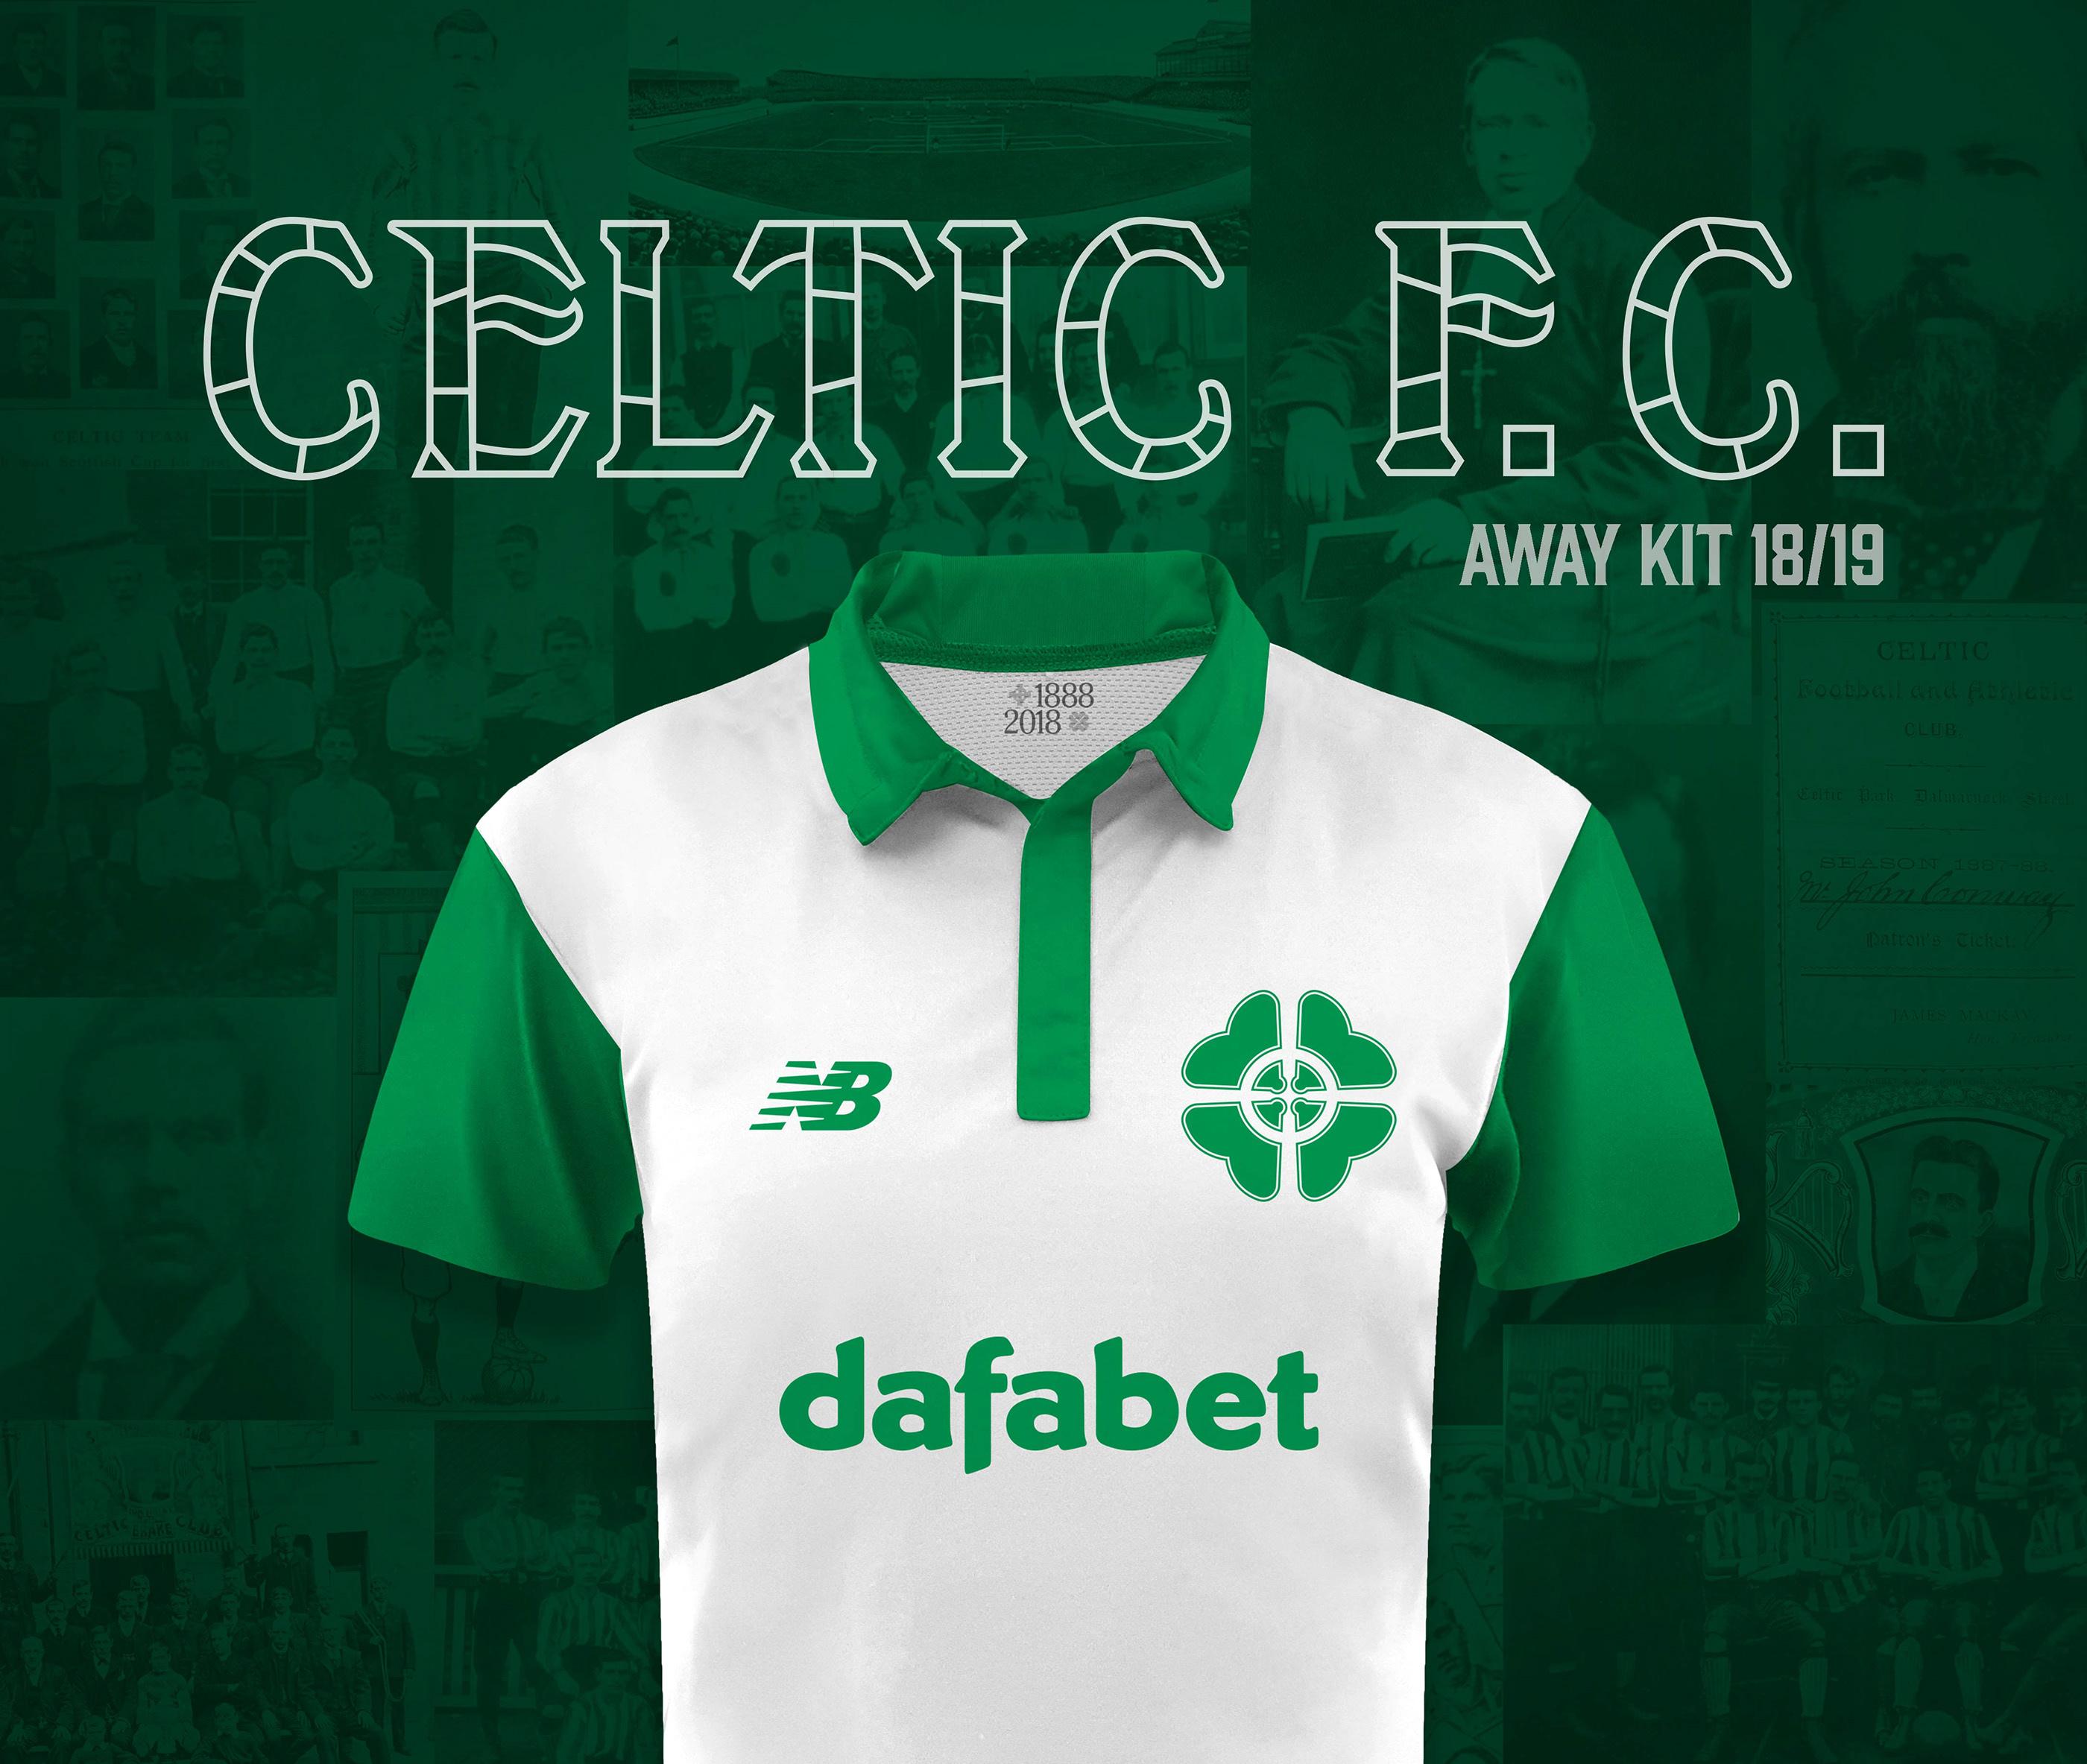 sports shoes c6603 cbff9 Celtic FC New Balance Away Jersey 18/19 Concept Kit on Behance